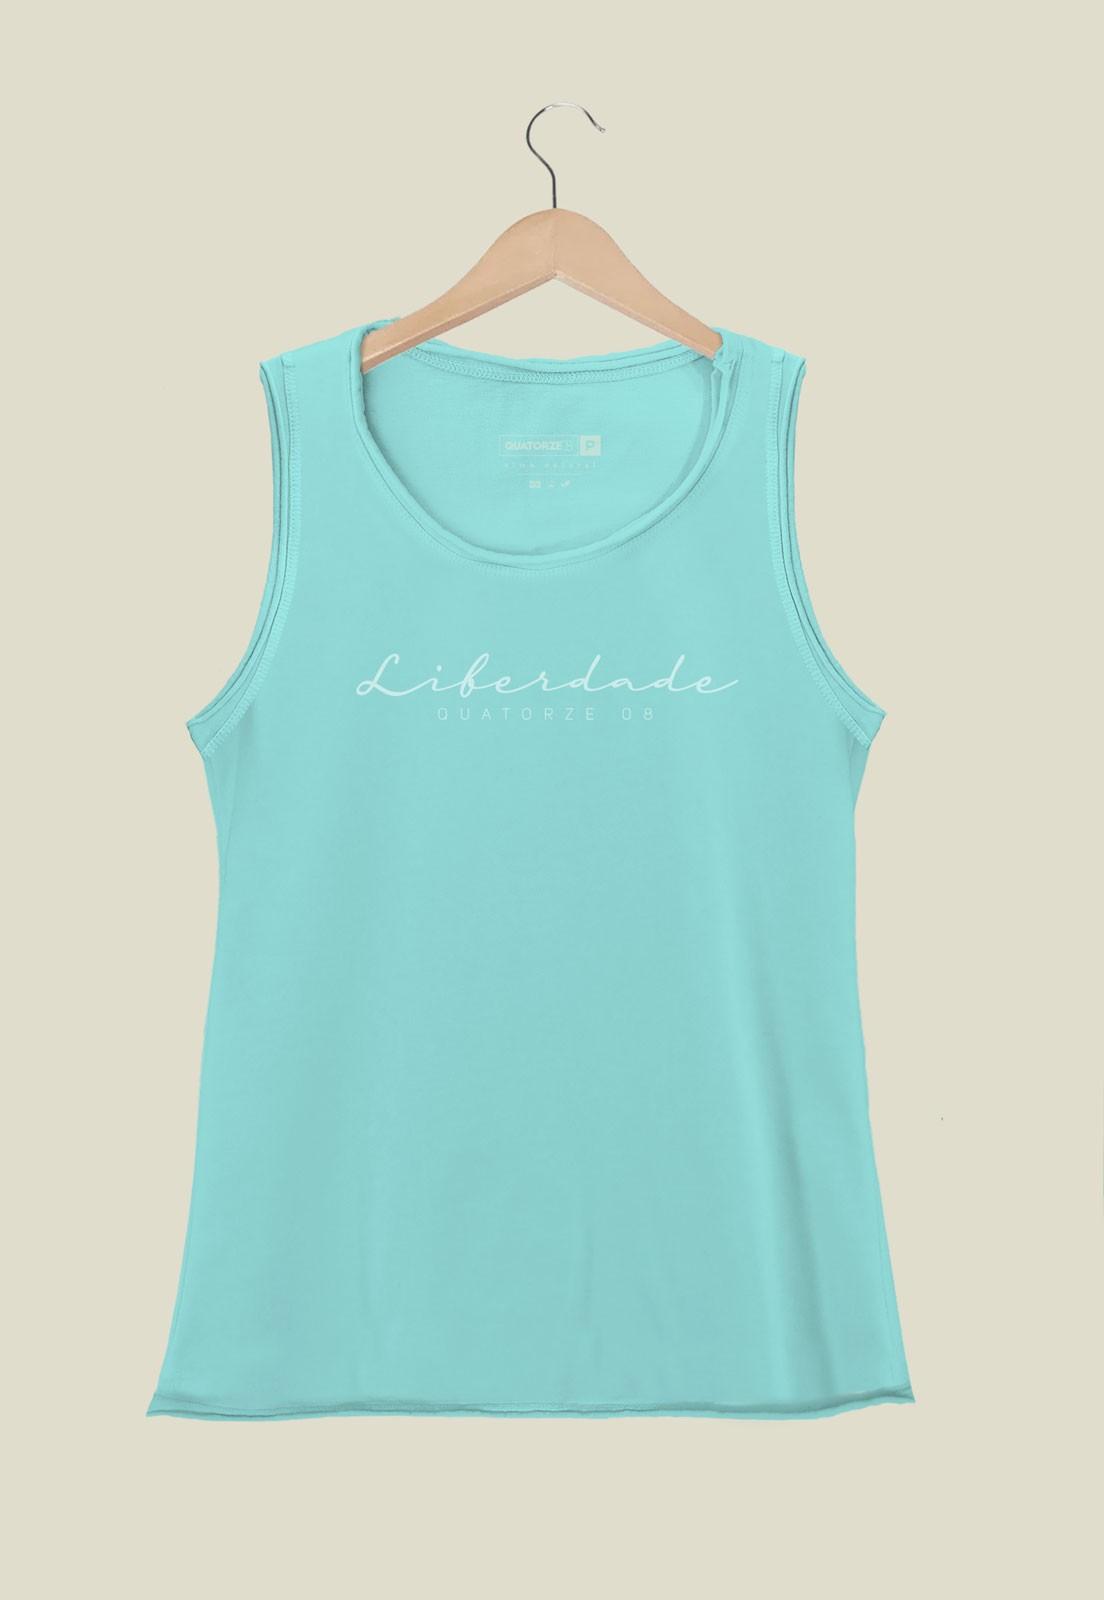 Camiseta Feminina Regata Liberdade Azul Claro Estonada